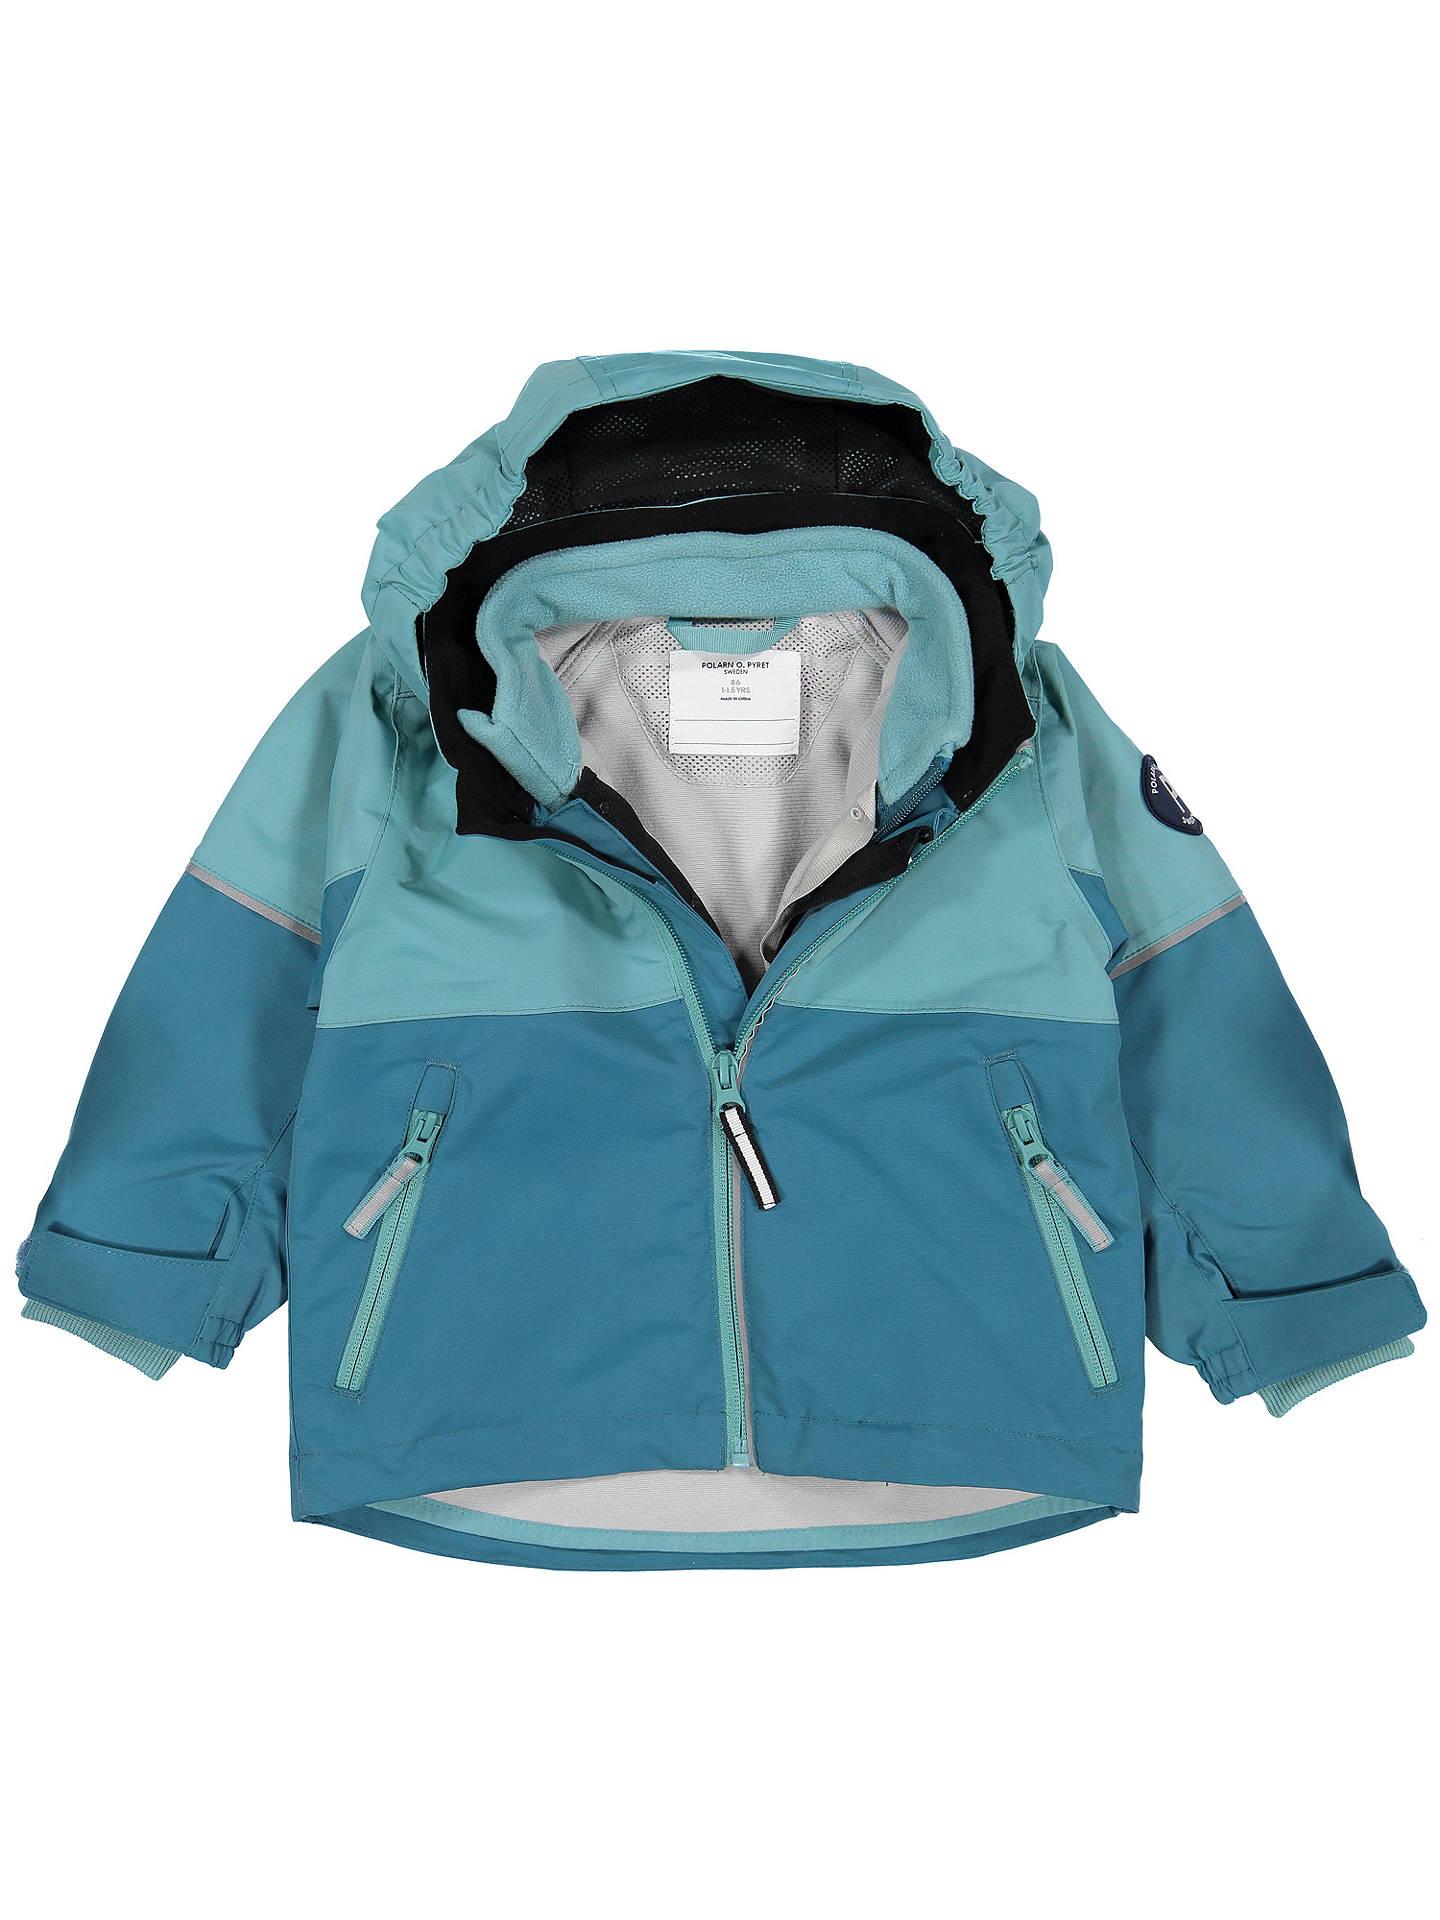 8f8c0145f3e7 Polarn O. Pyret Baby Waterproof Shell Coat